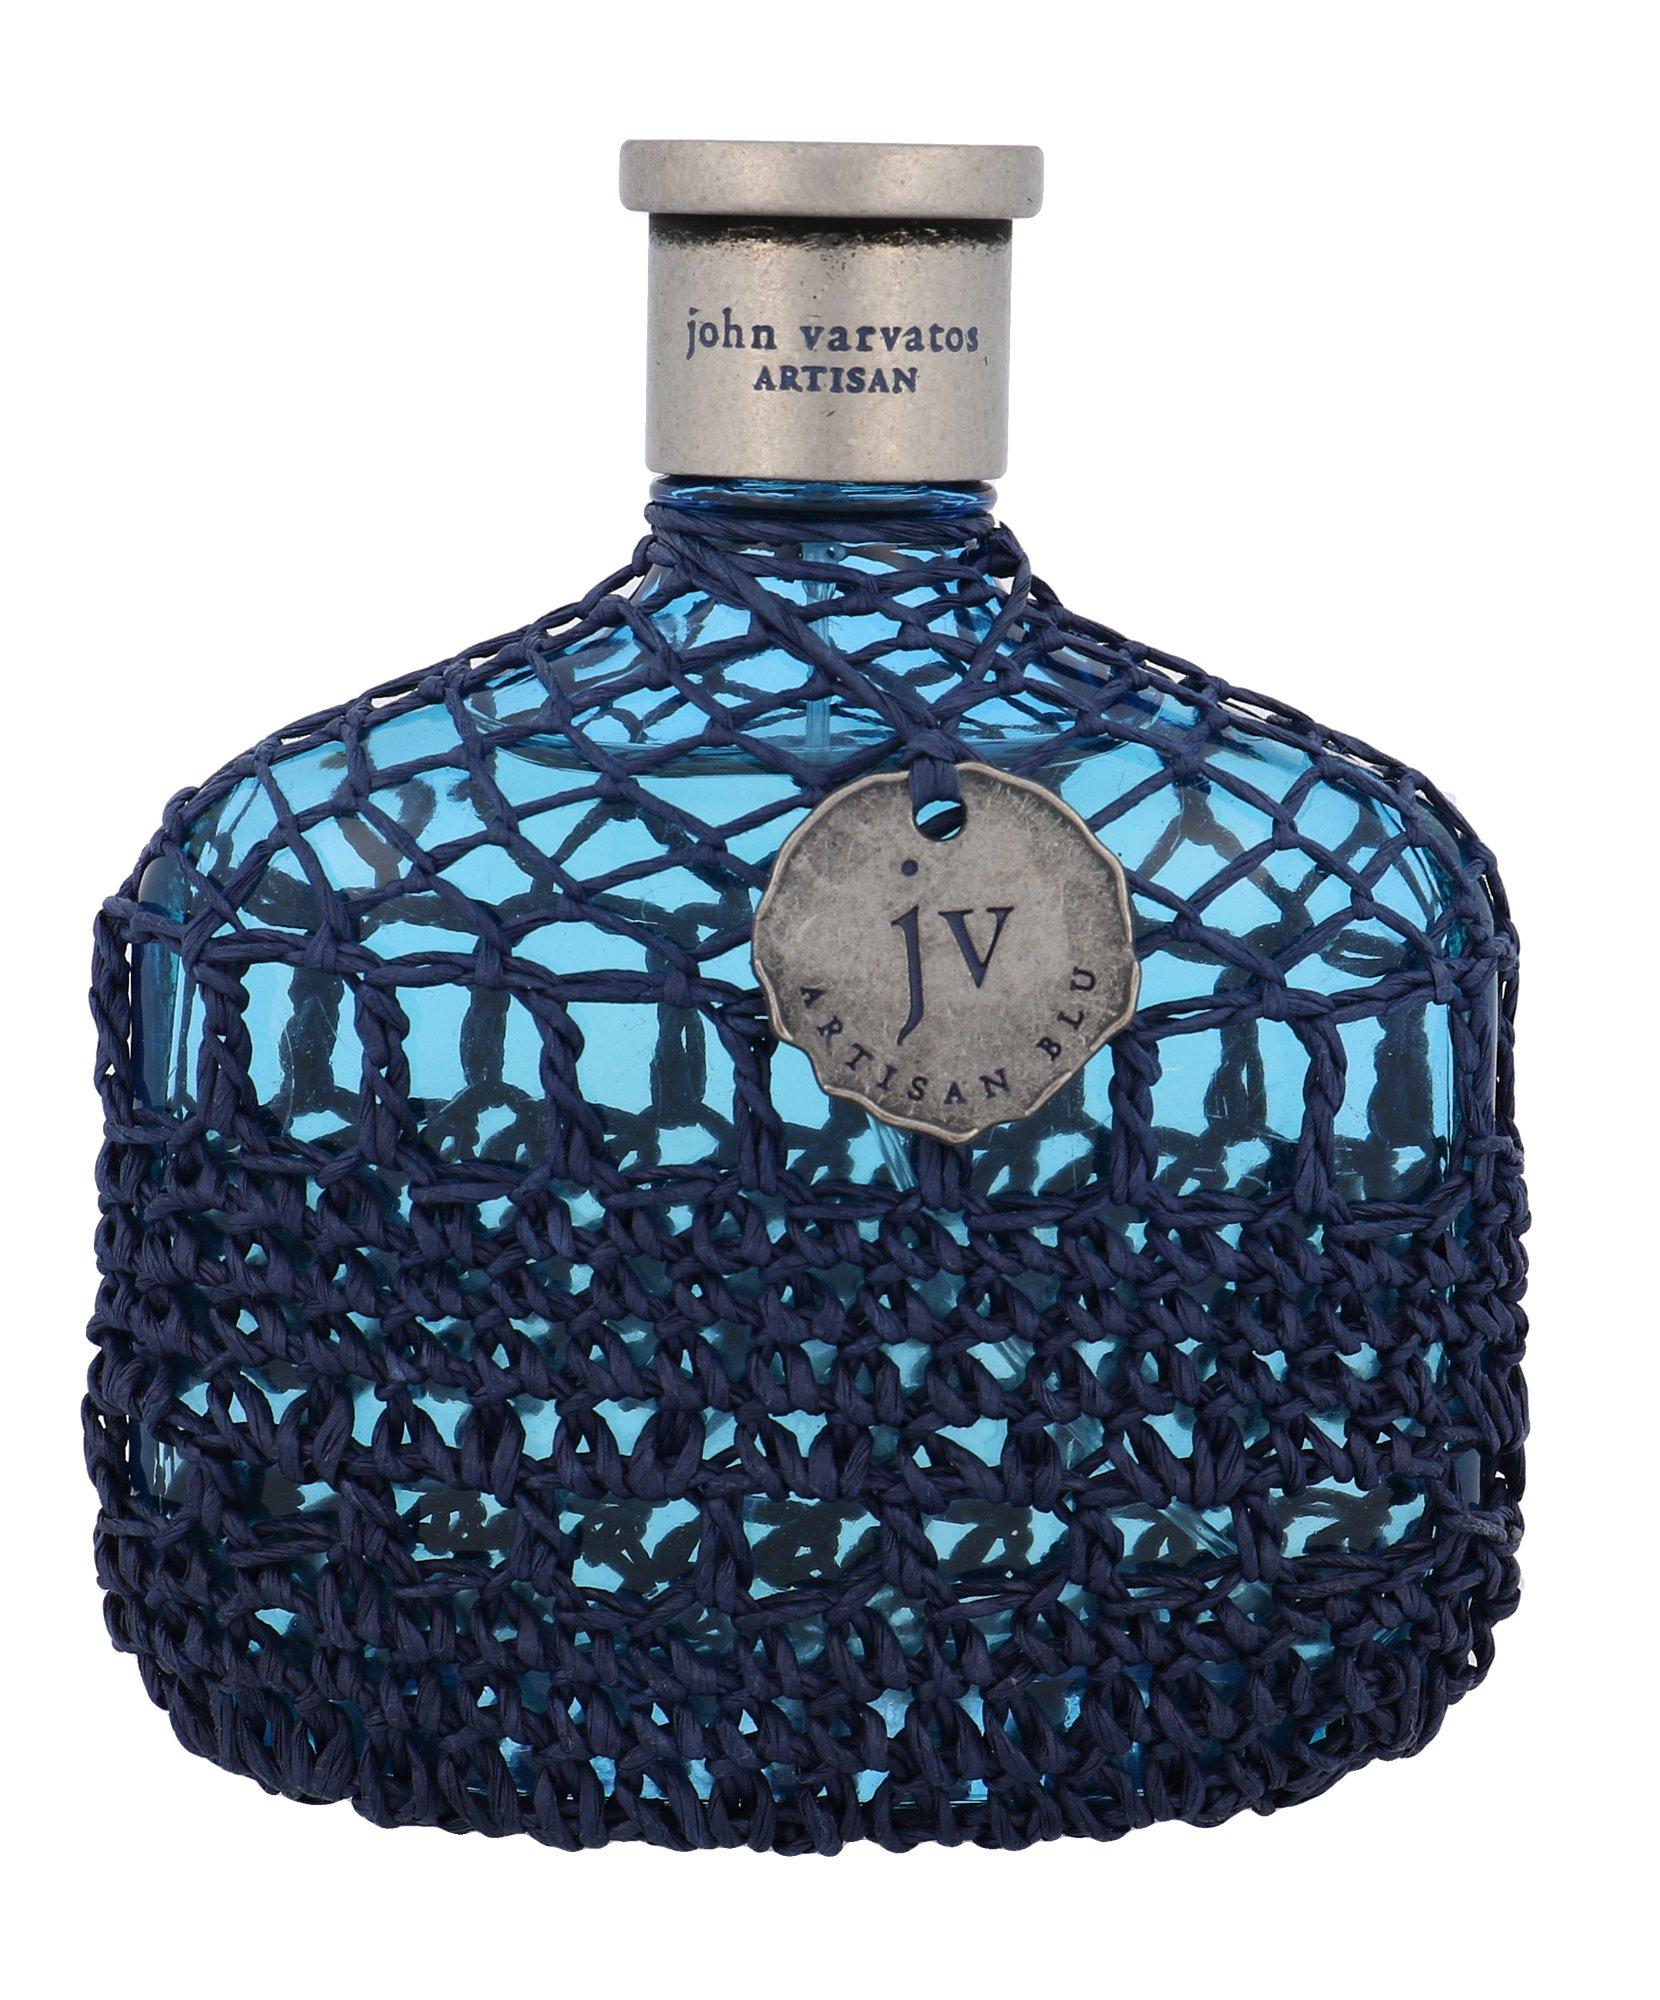 John Varvatos Artisan Blu, edt 125ml